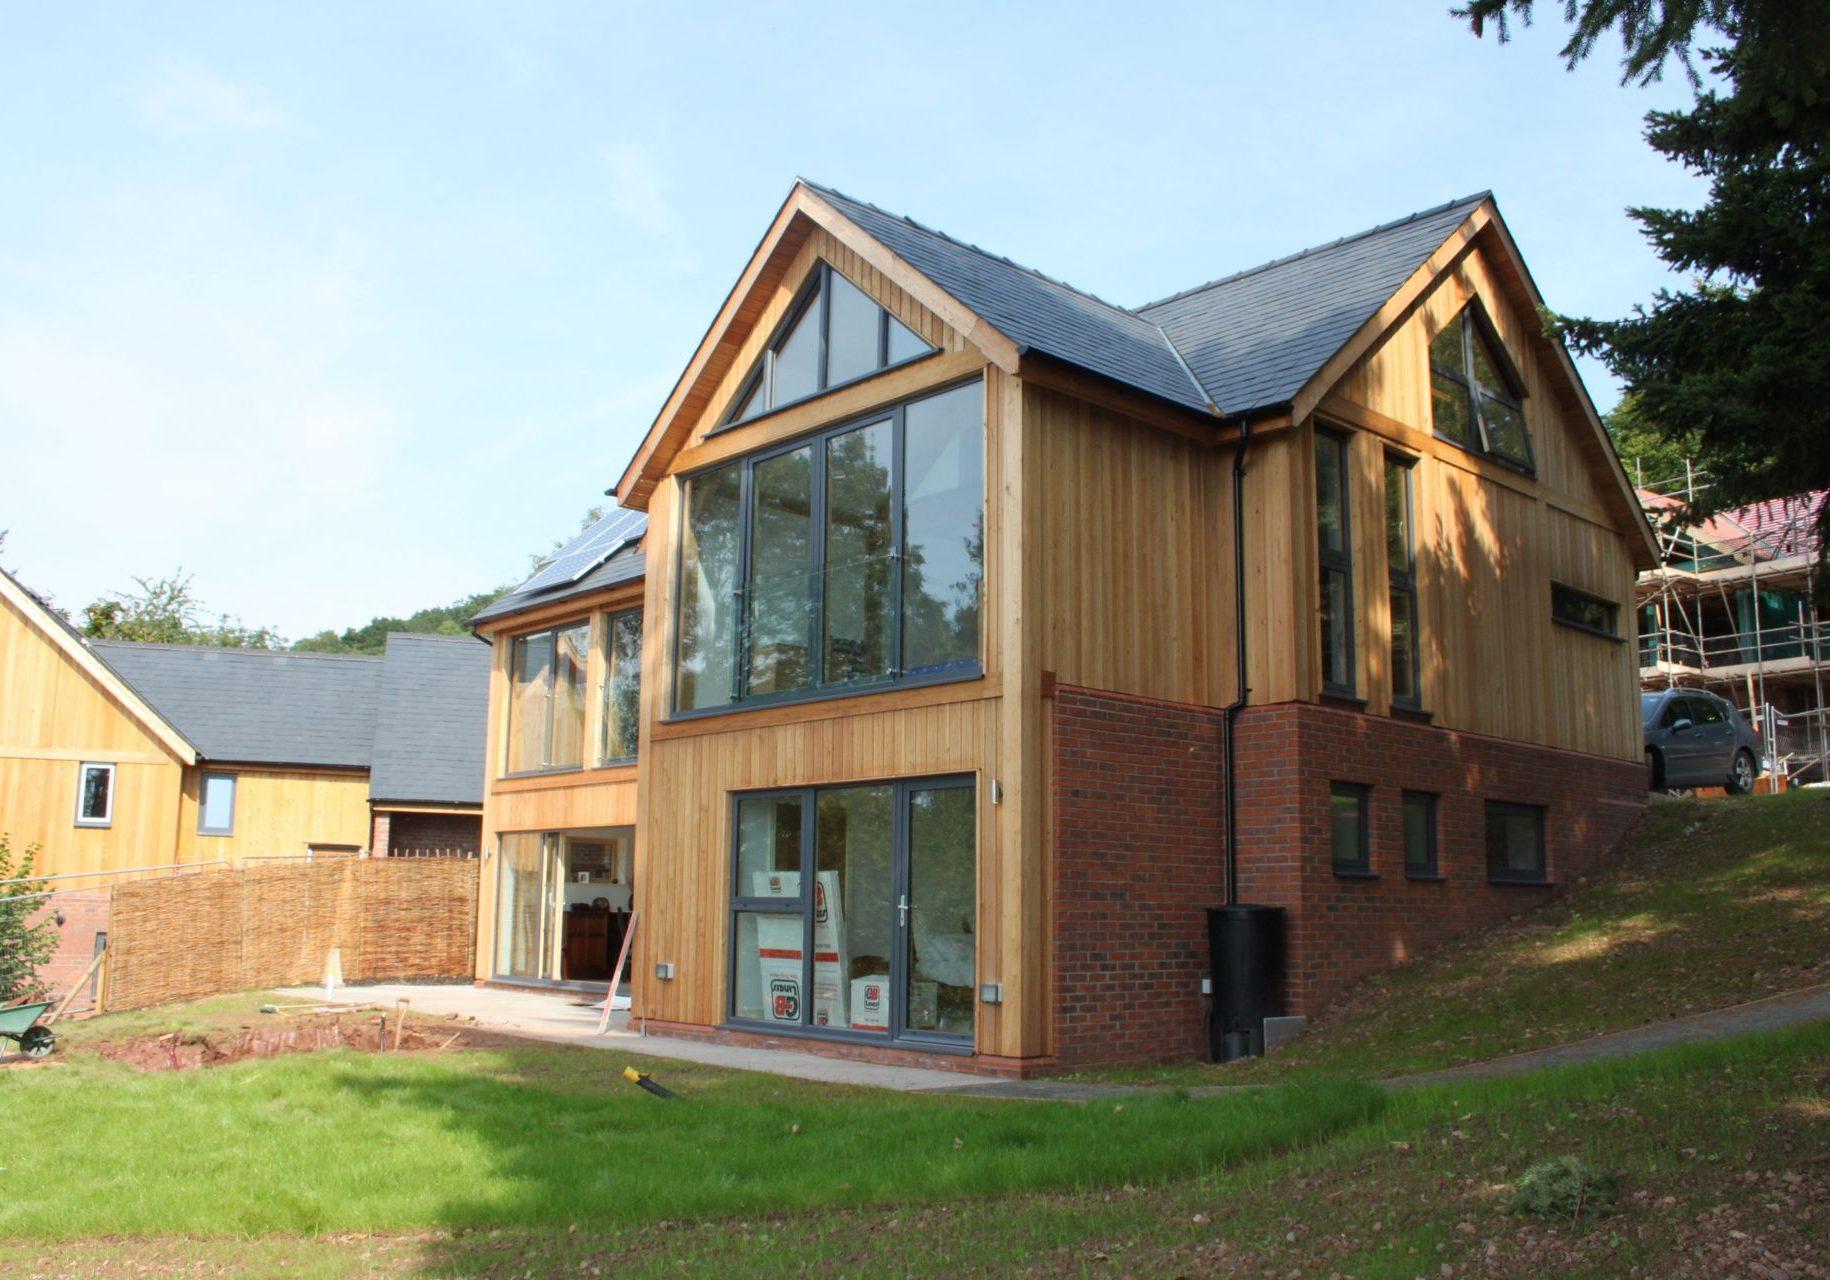 5 bespoke timber framed dwellings, Herefordshire